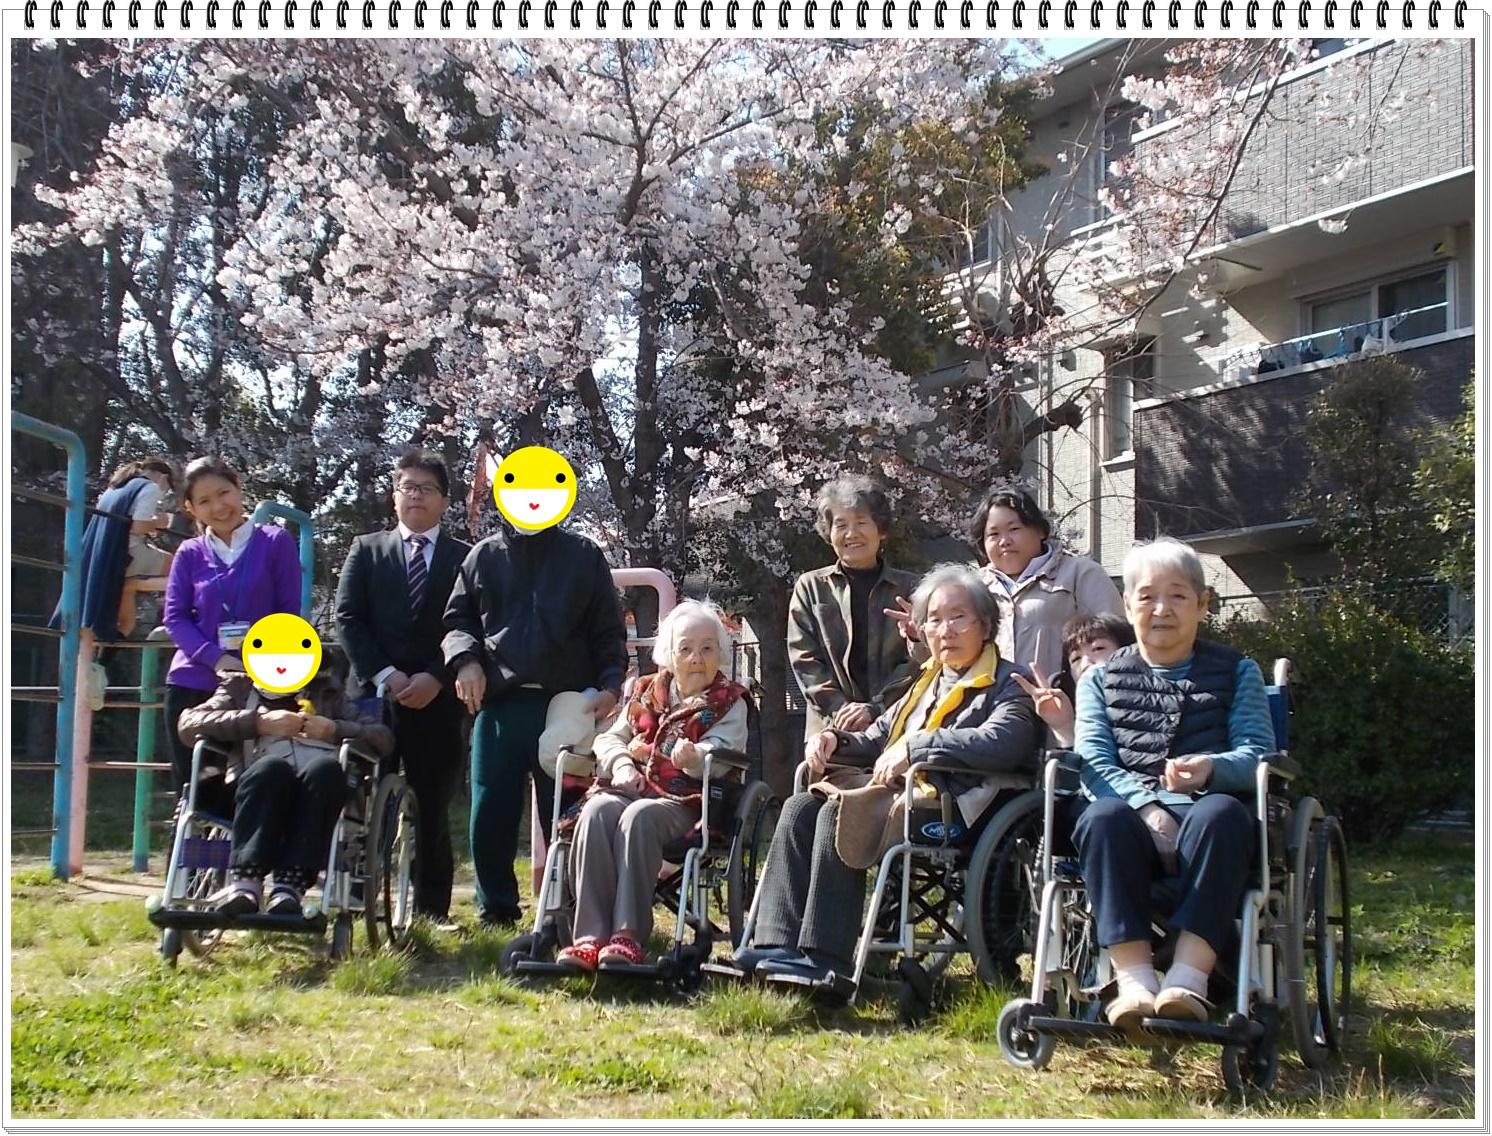 http://www.supercourt.jp/blog/hirano/4.5.JPG